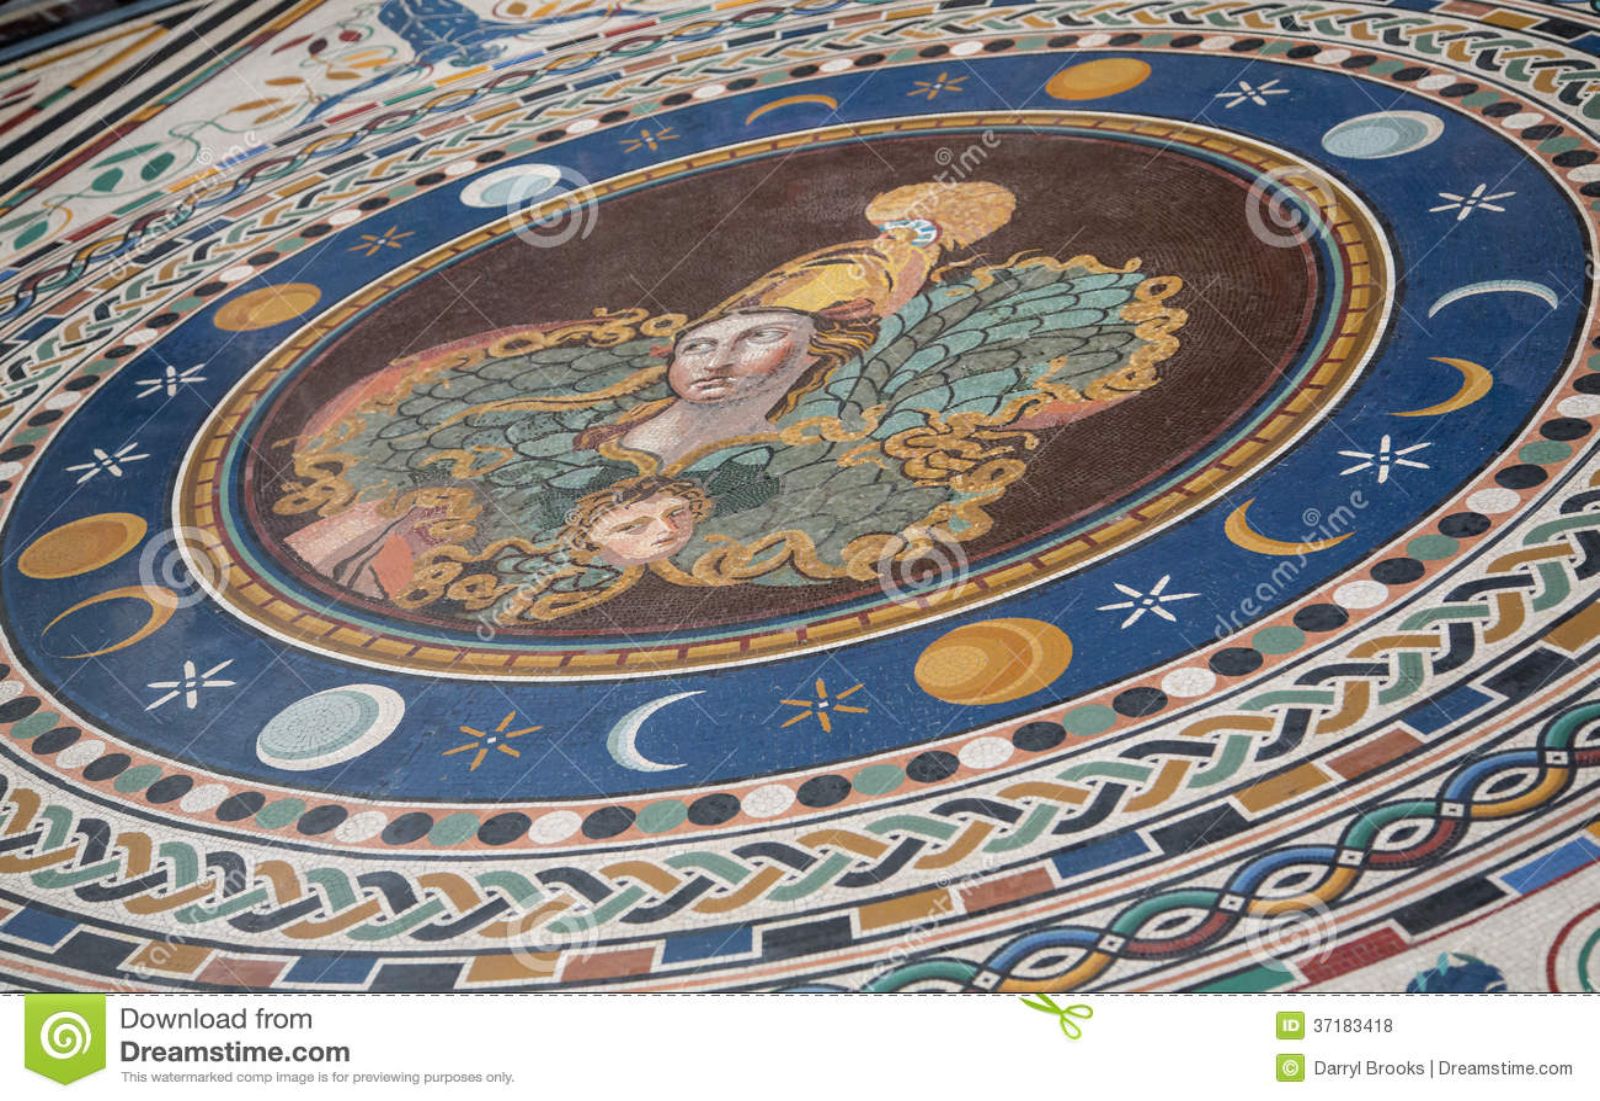 Mosaic Tile Woman On Vatican Floor Stock Photo Image 37183418